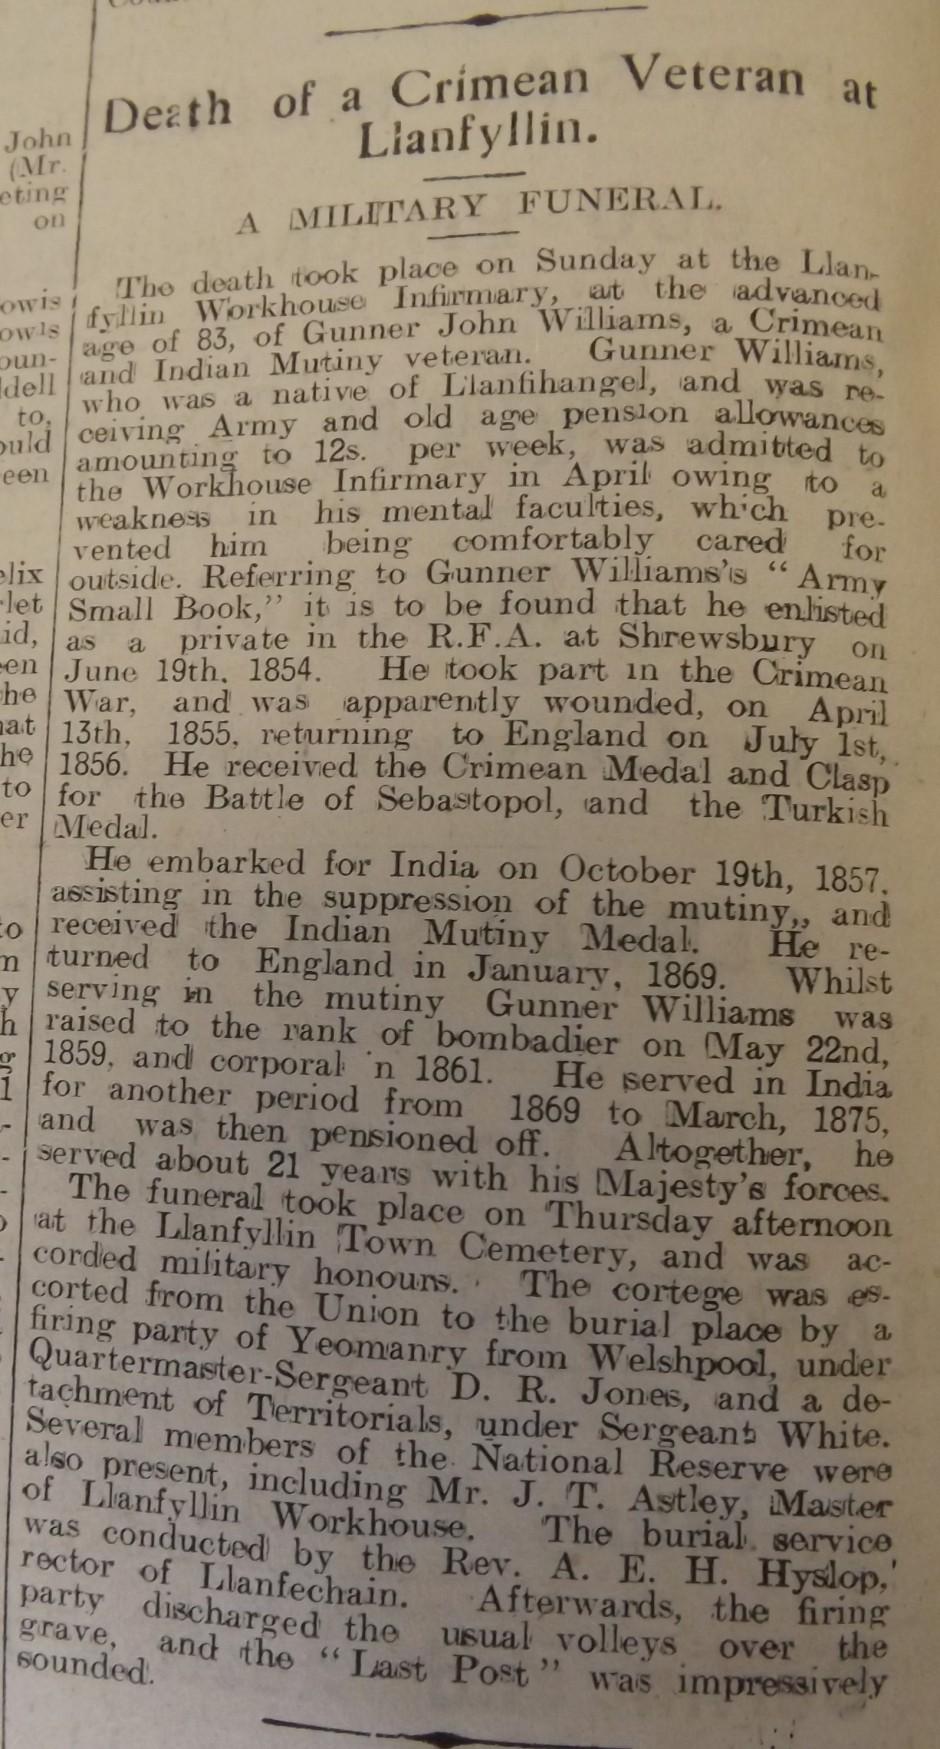 NP-L-39-15 - John Williams Crimean Veteran dies 1914